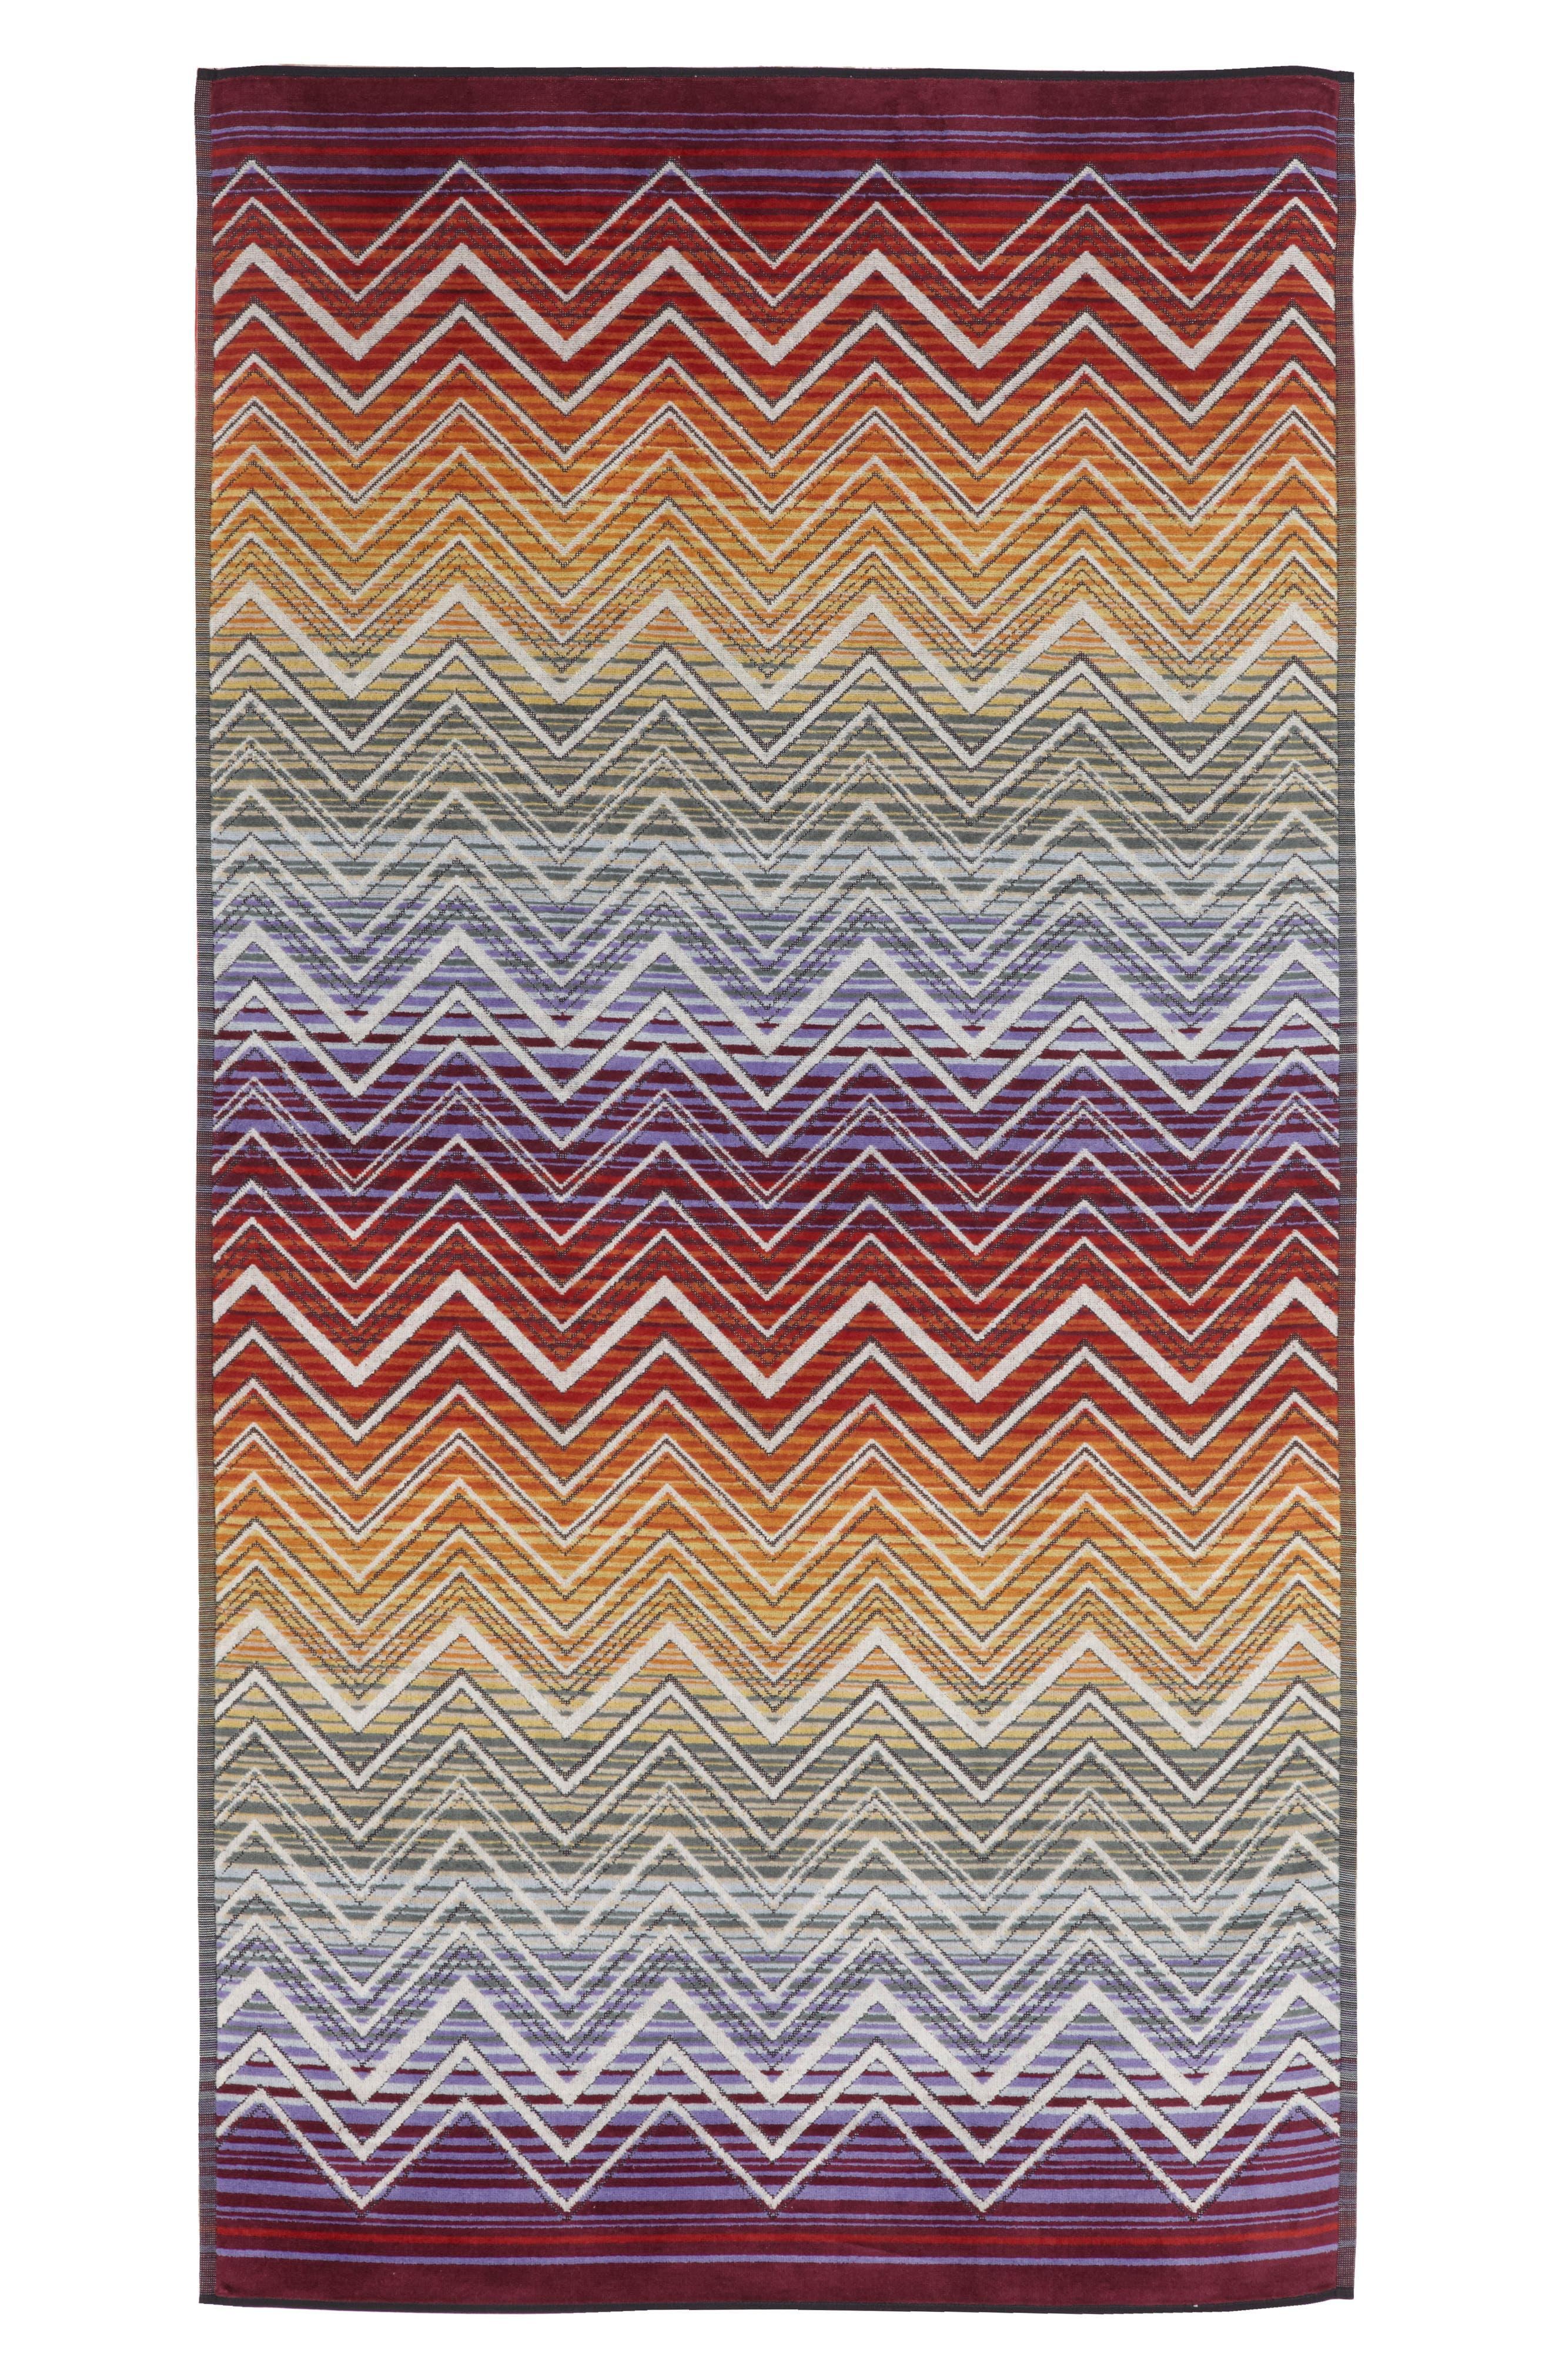 Tolomeo Hand Towel,                             Main thumbnail 1, color,                             Multi Red